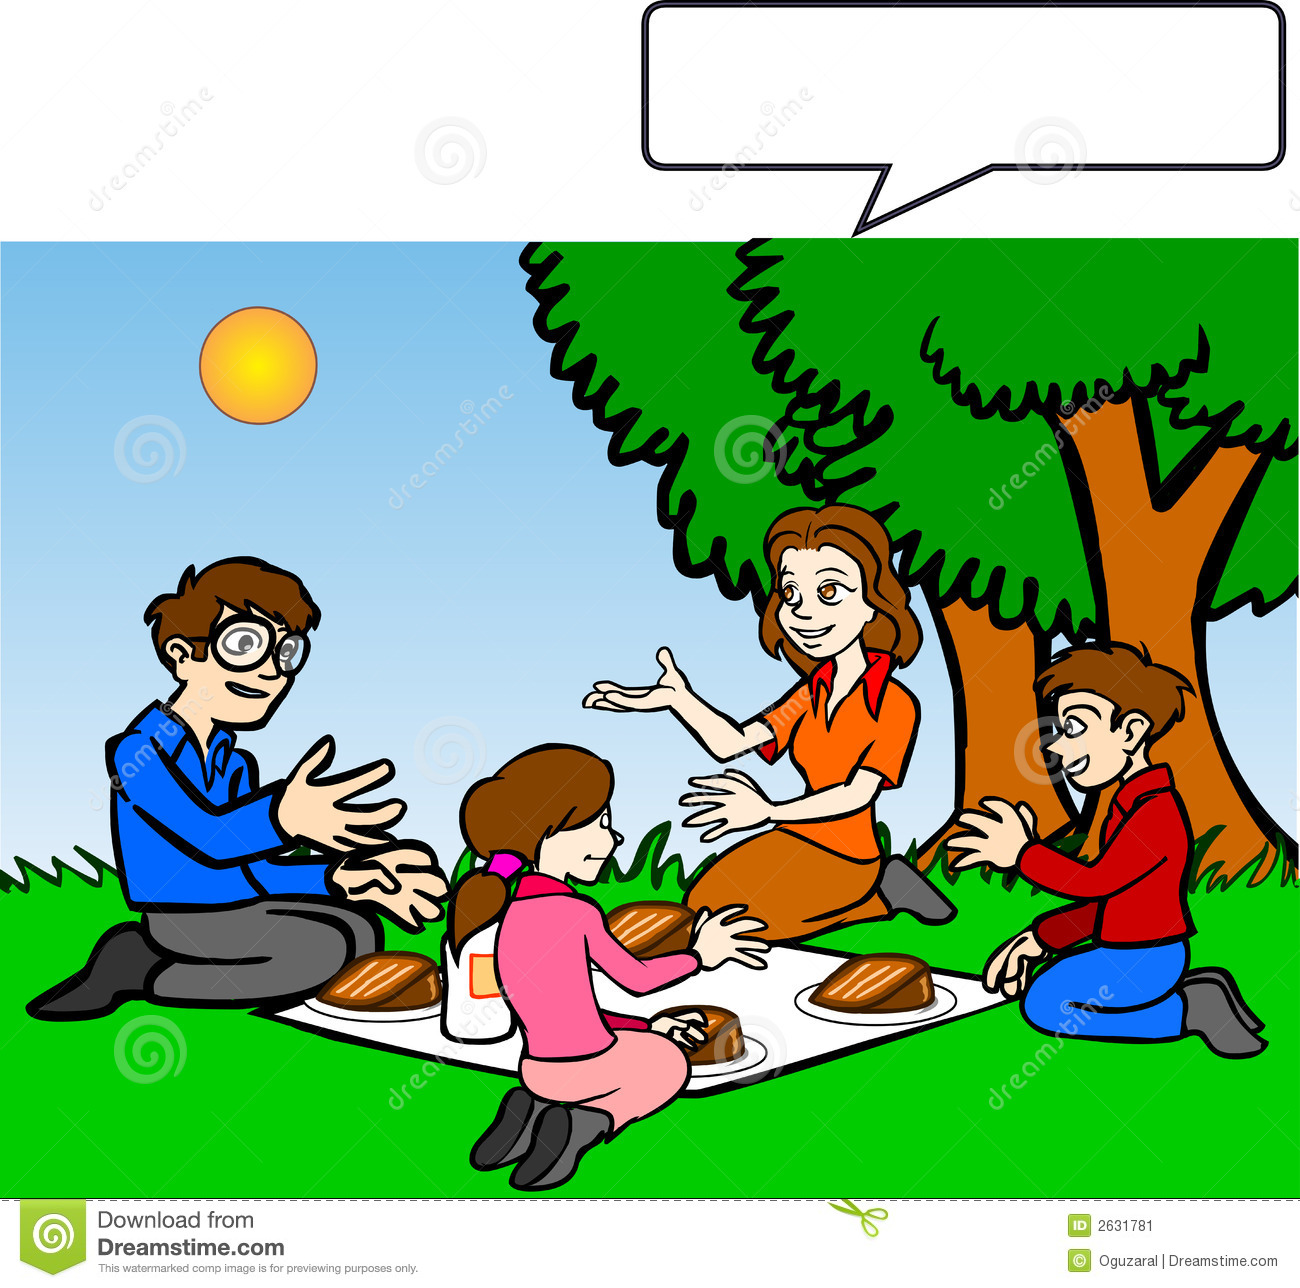 family picnic clipart - photo #8